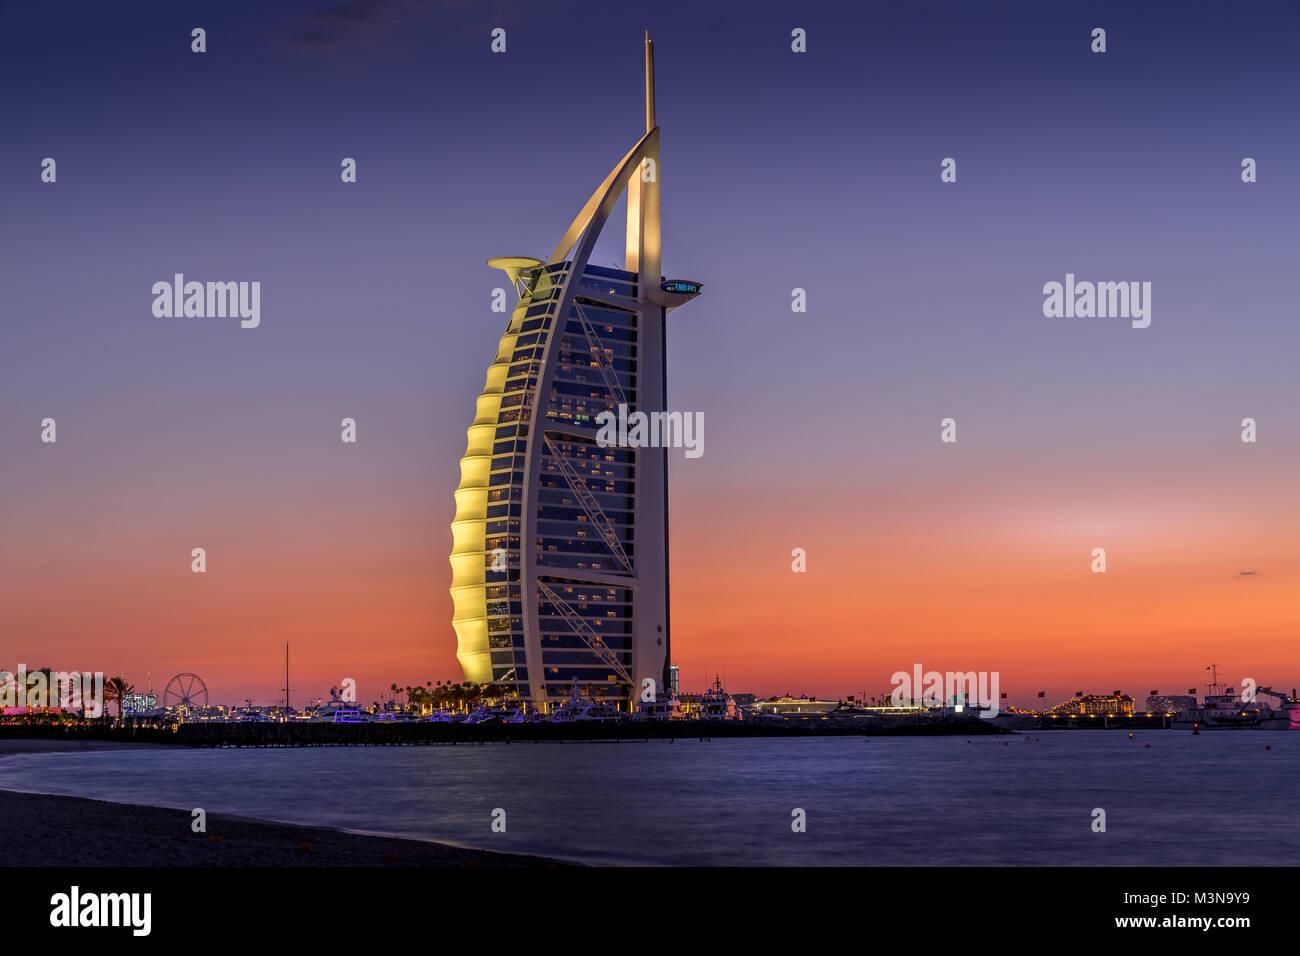 Dubai, Vereinigte Arabische Emirate - Jan 10, 2018. Sonnenuntergang Blick auf das Burj Al Arab Hotel am Jumeirah Stockbild